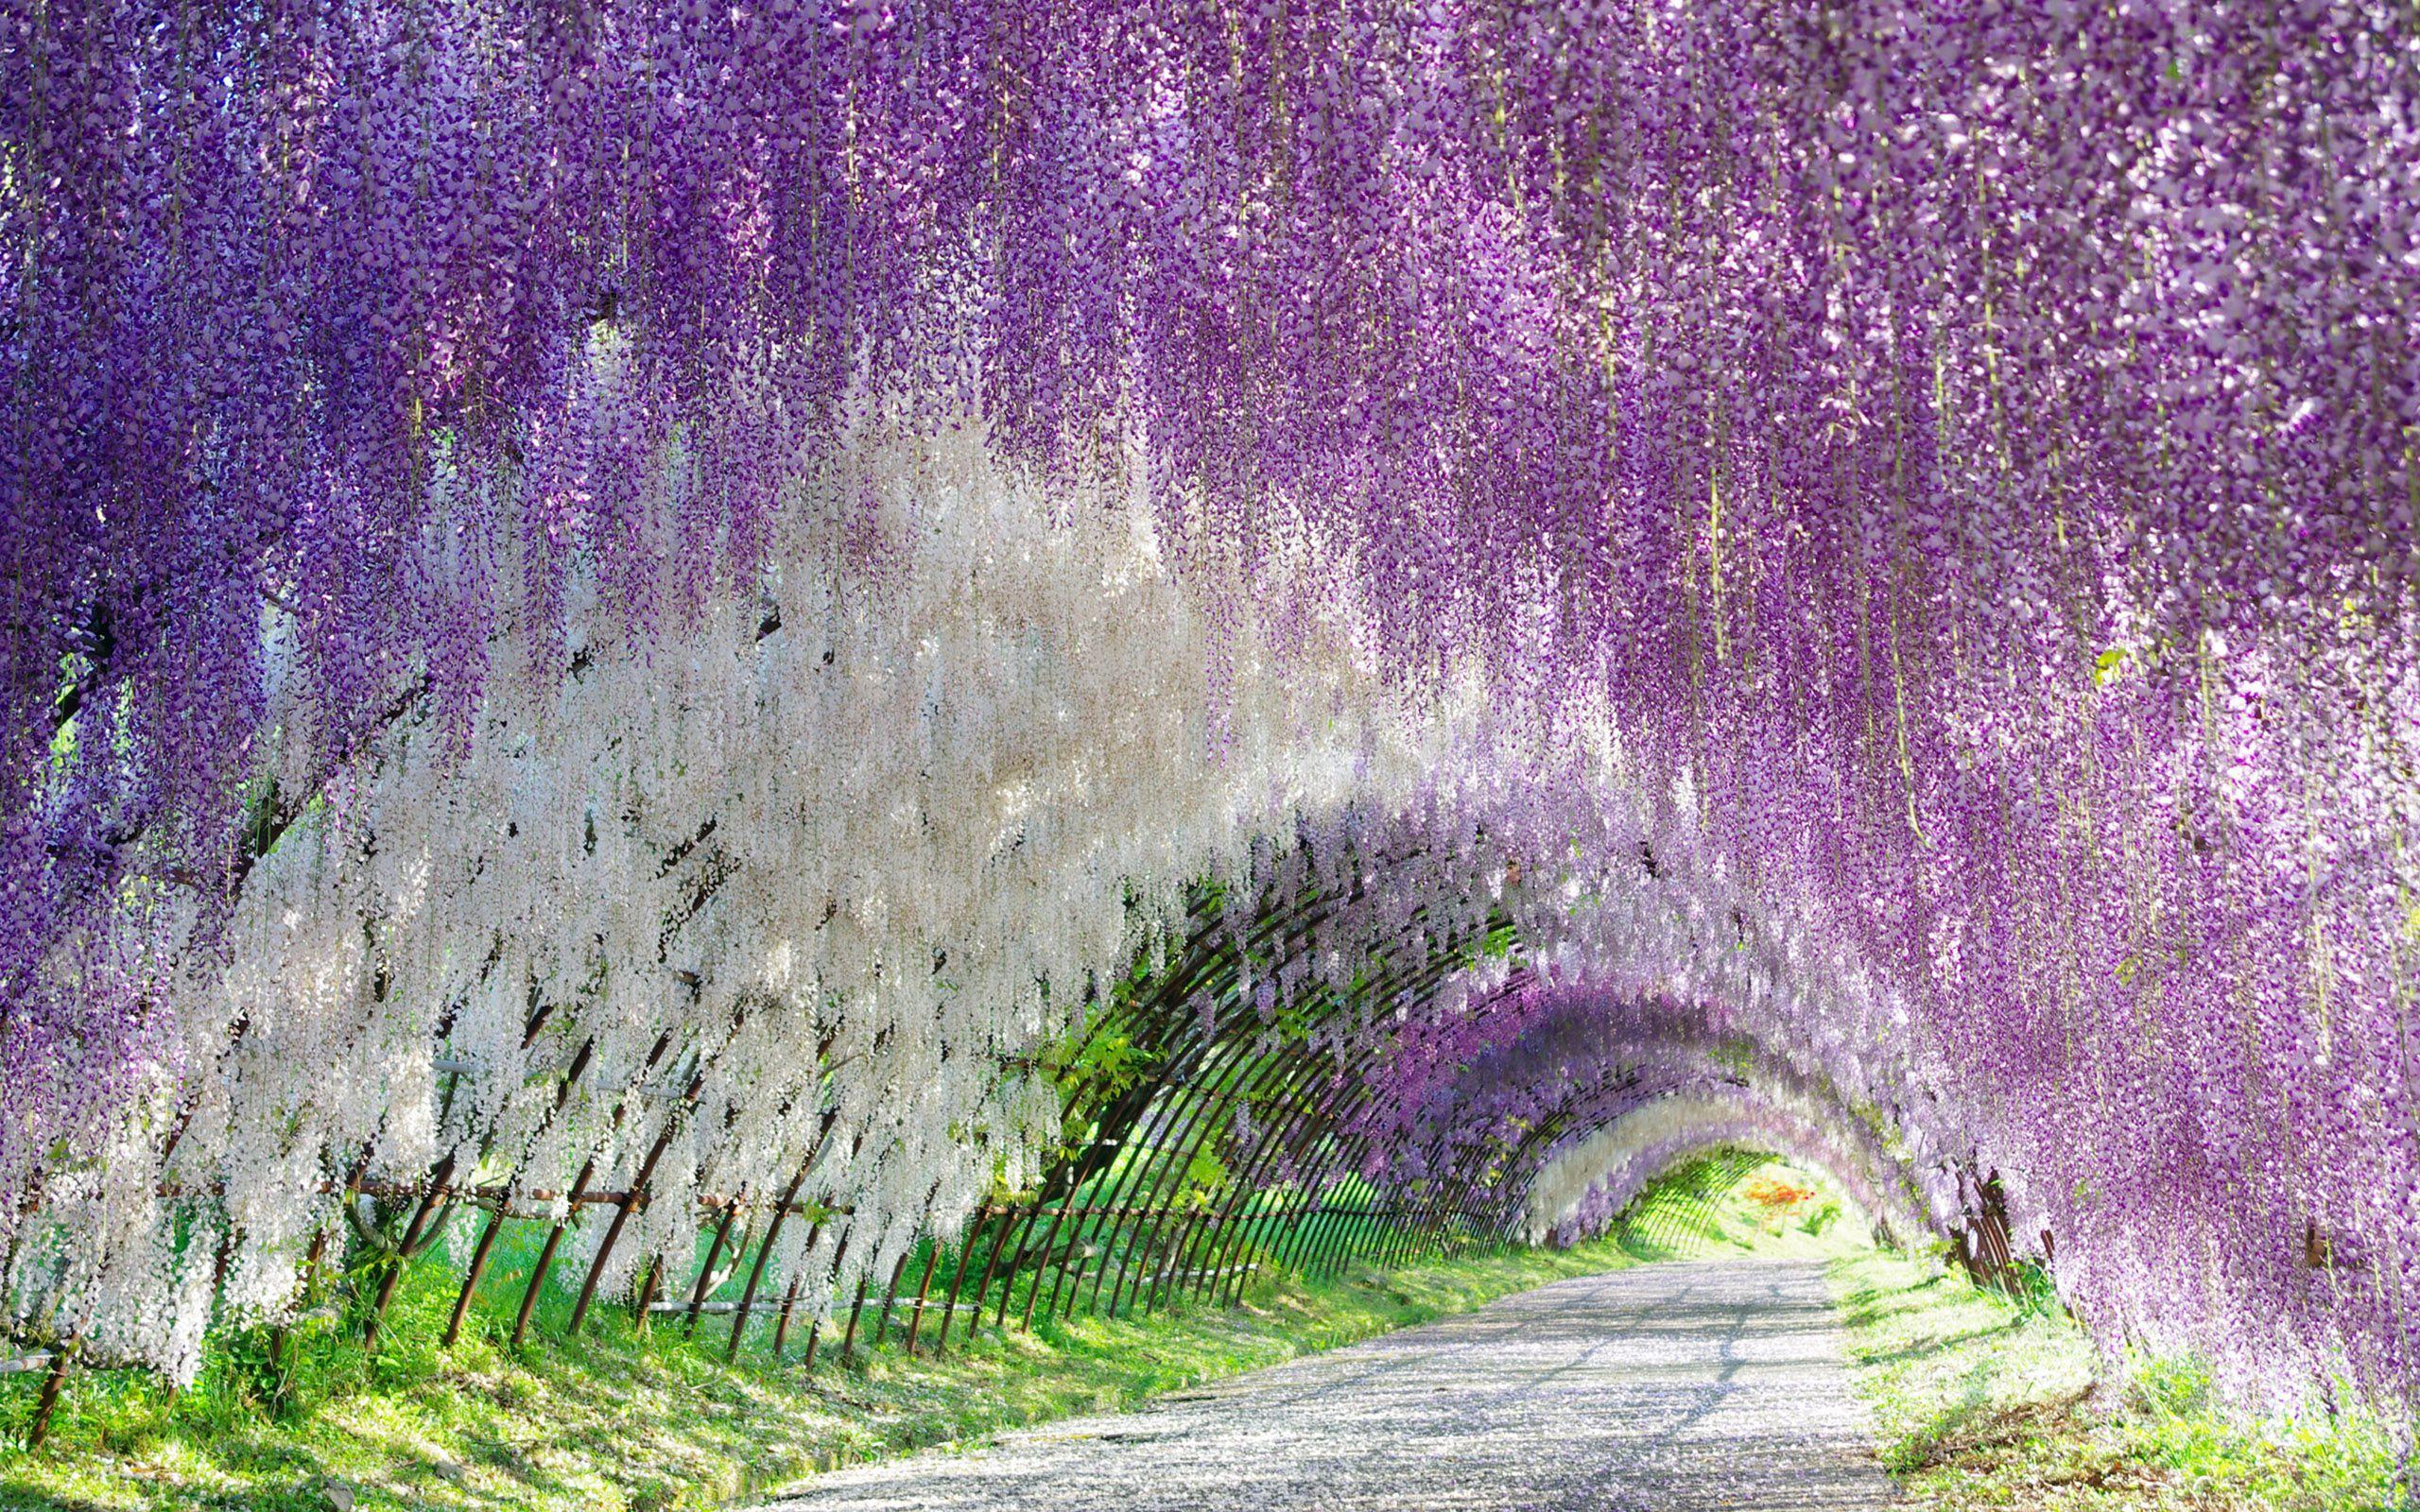 Wisteria Tunnel Kawachi Wisteria Gardens Kitakyushu Japan Photographer Unknown Kitakyushu Colorful Places Magical Places